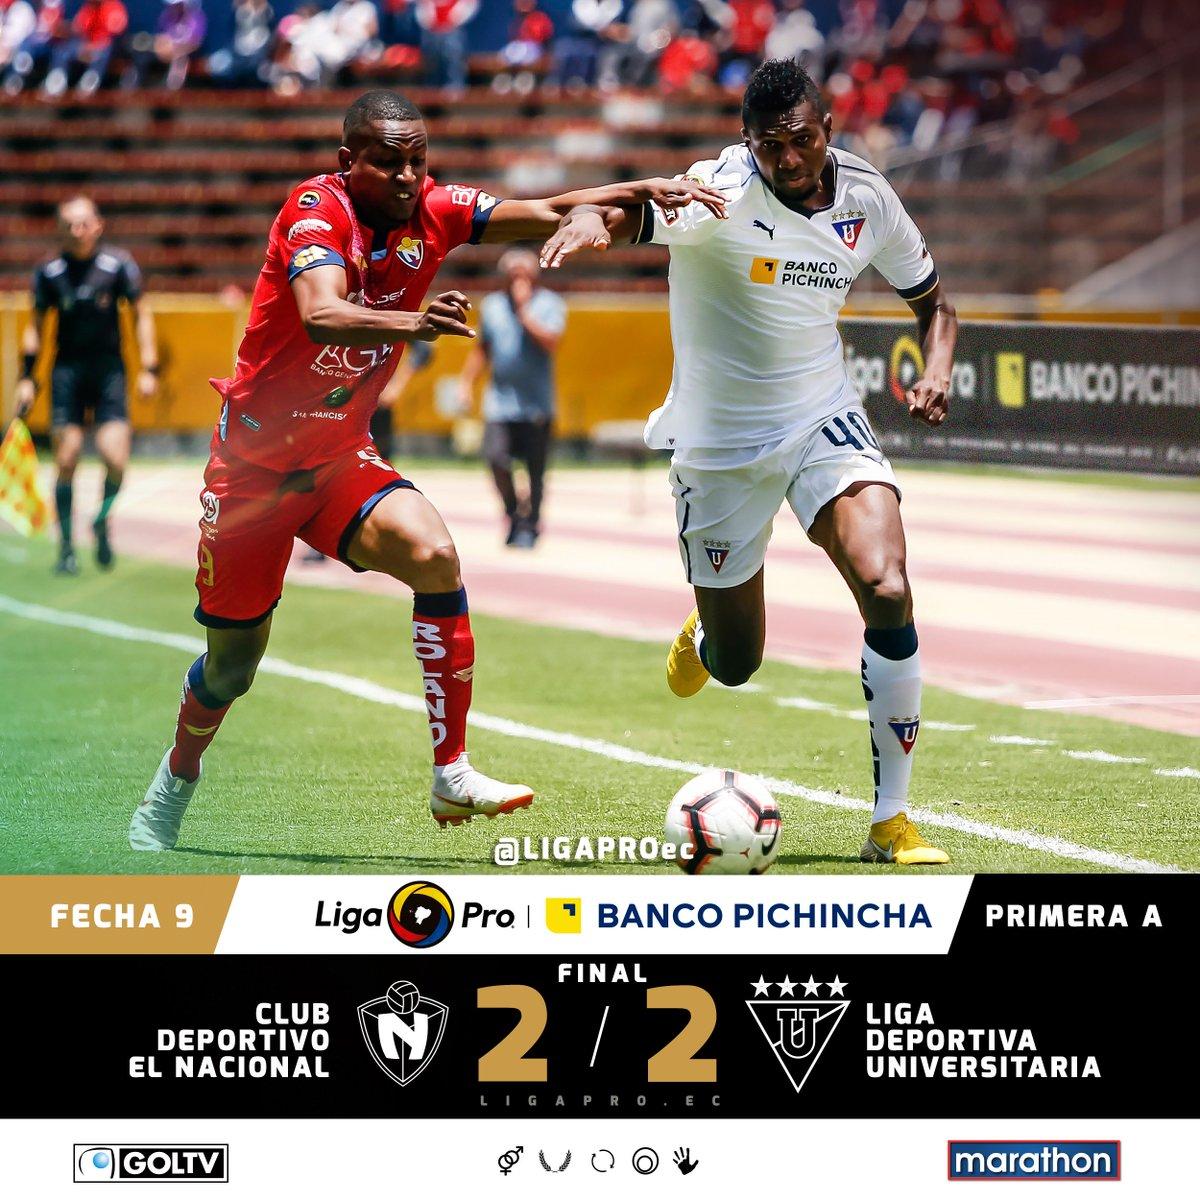 LigaPro Ecuador 🇪🇨⚽️'s photo on borja